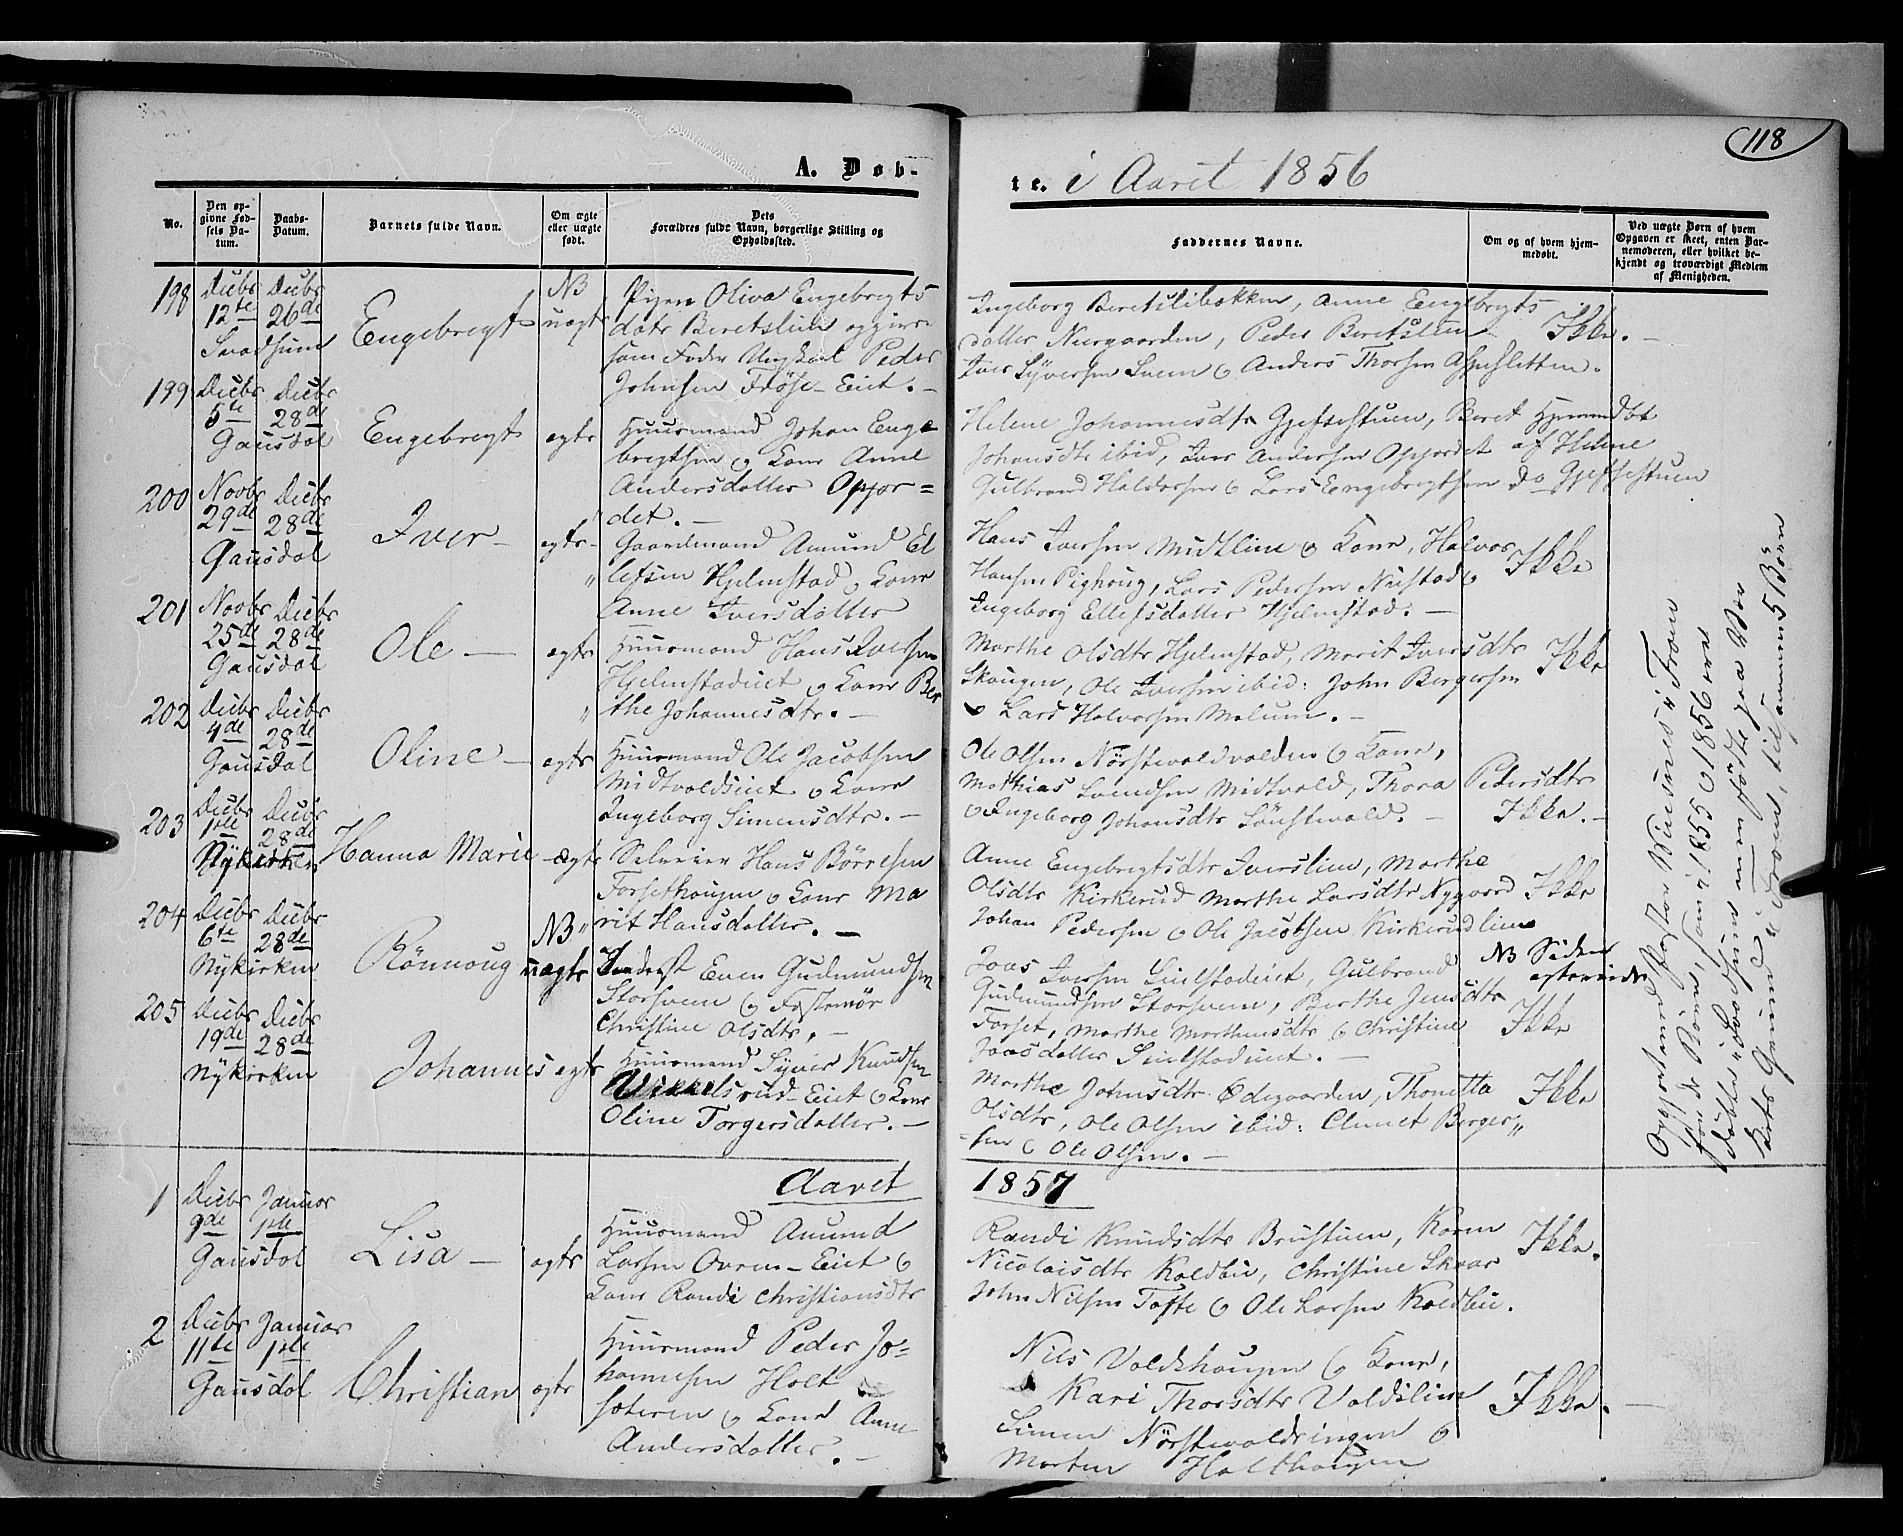 SAH, Gausdal prestekontor, Ministerialbok nr. 8, 1850-1861, s. 118